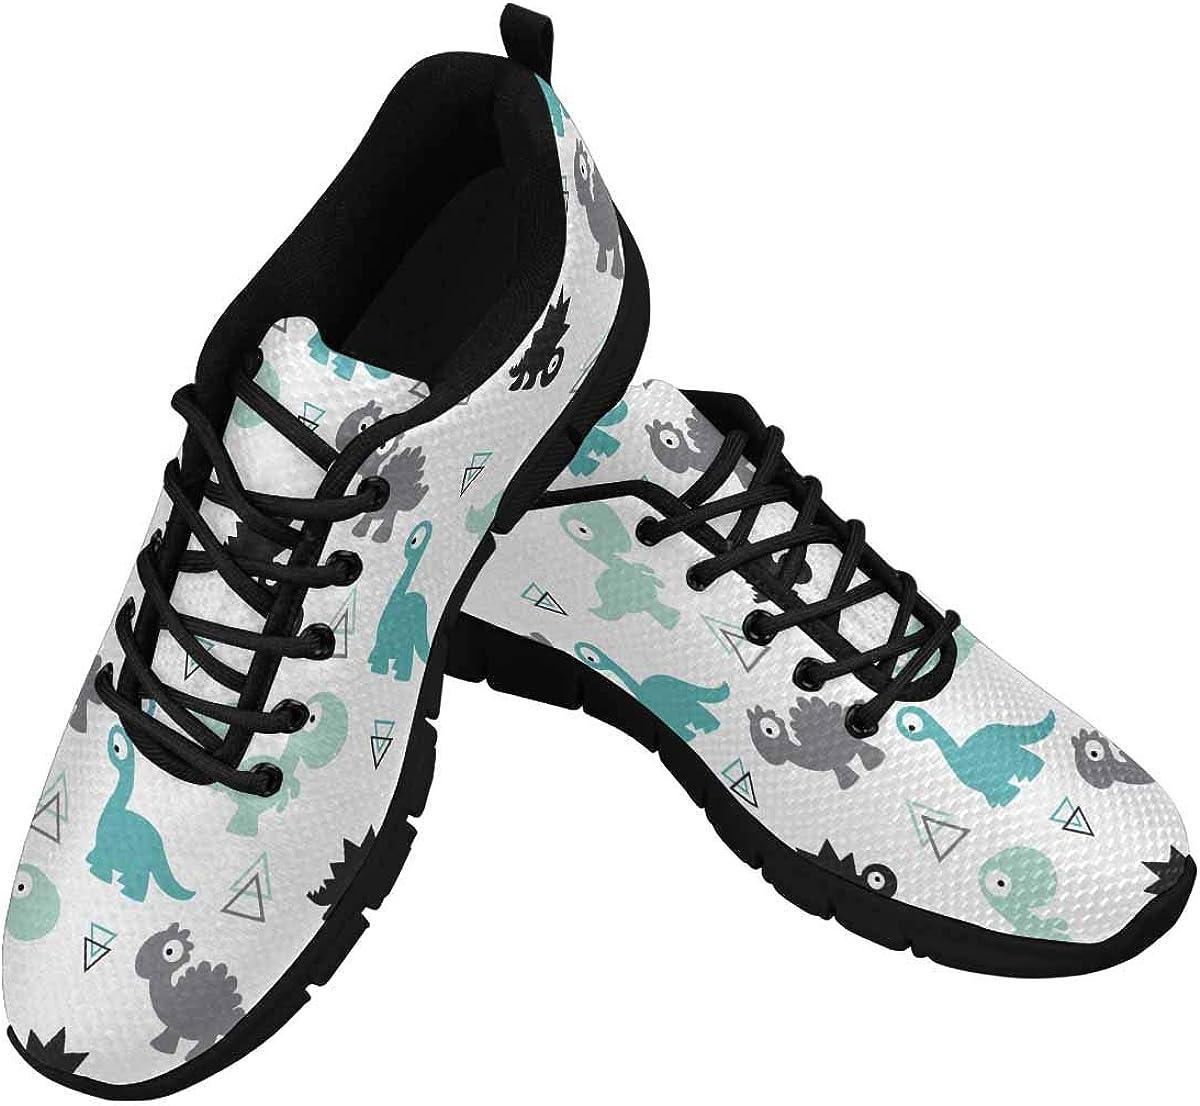 InterestPrint Girls and Boys, Colorful Dinosaurs Women's Tennis Running Shoes Lightweight Sneakers